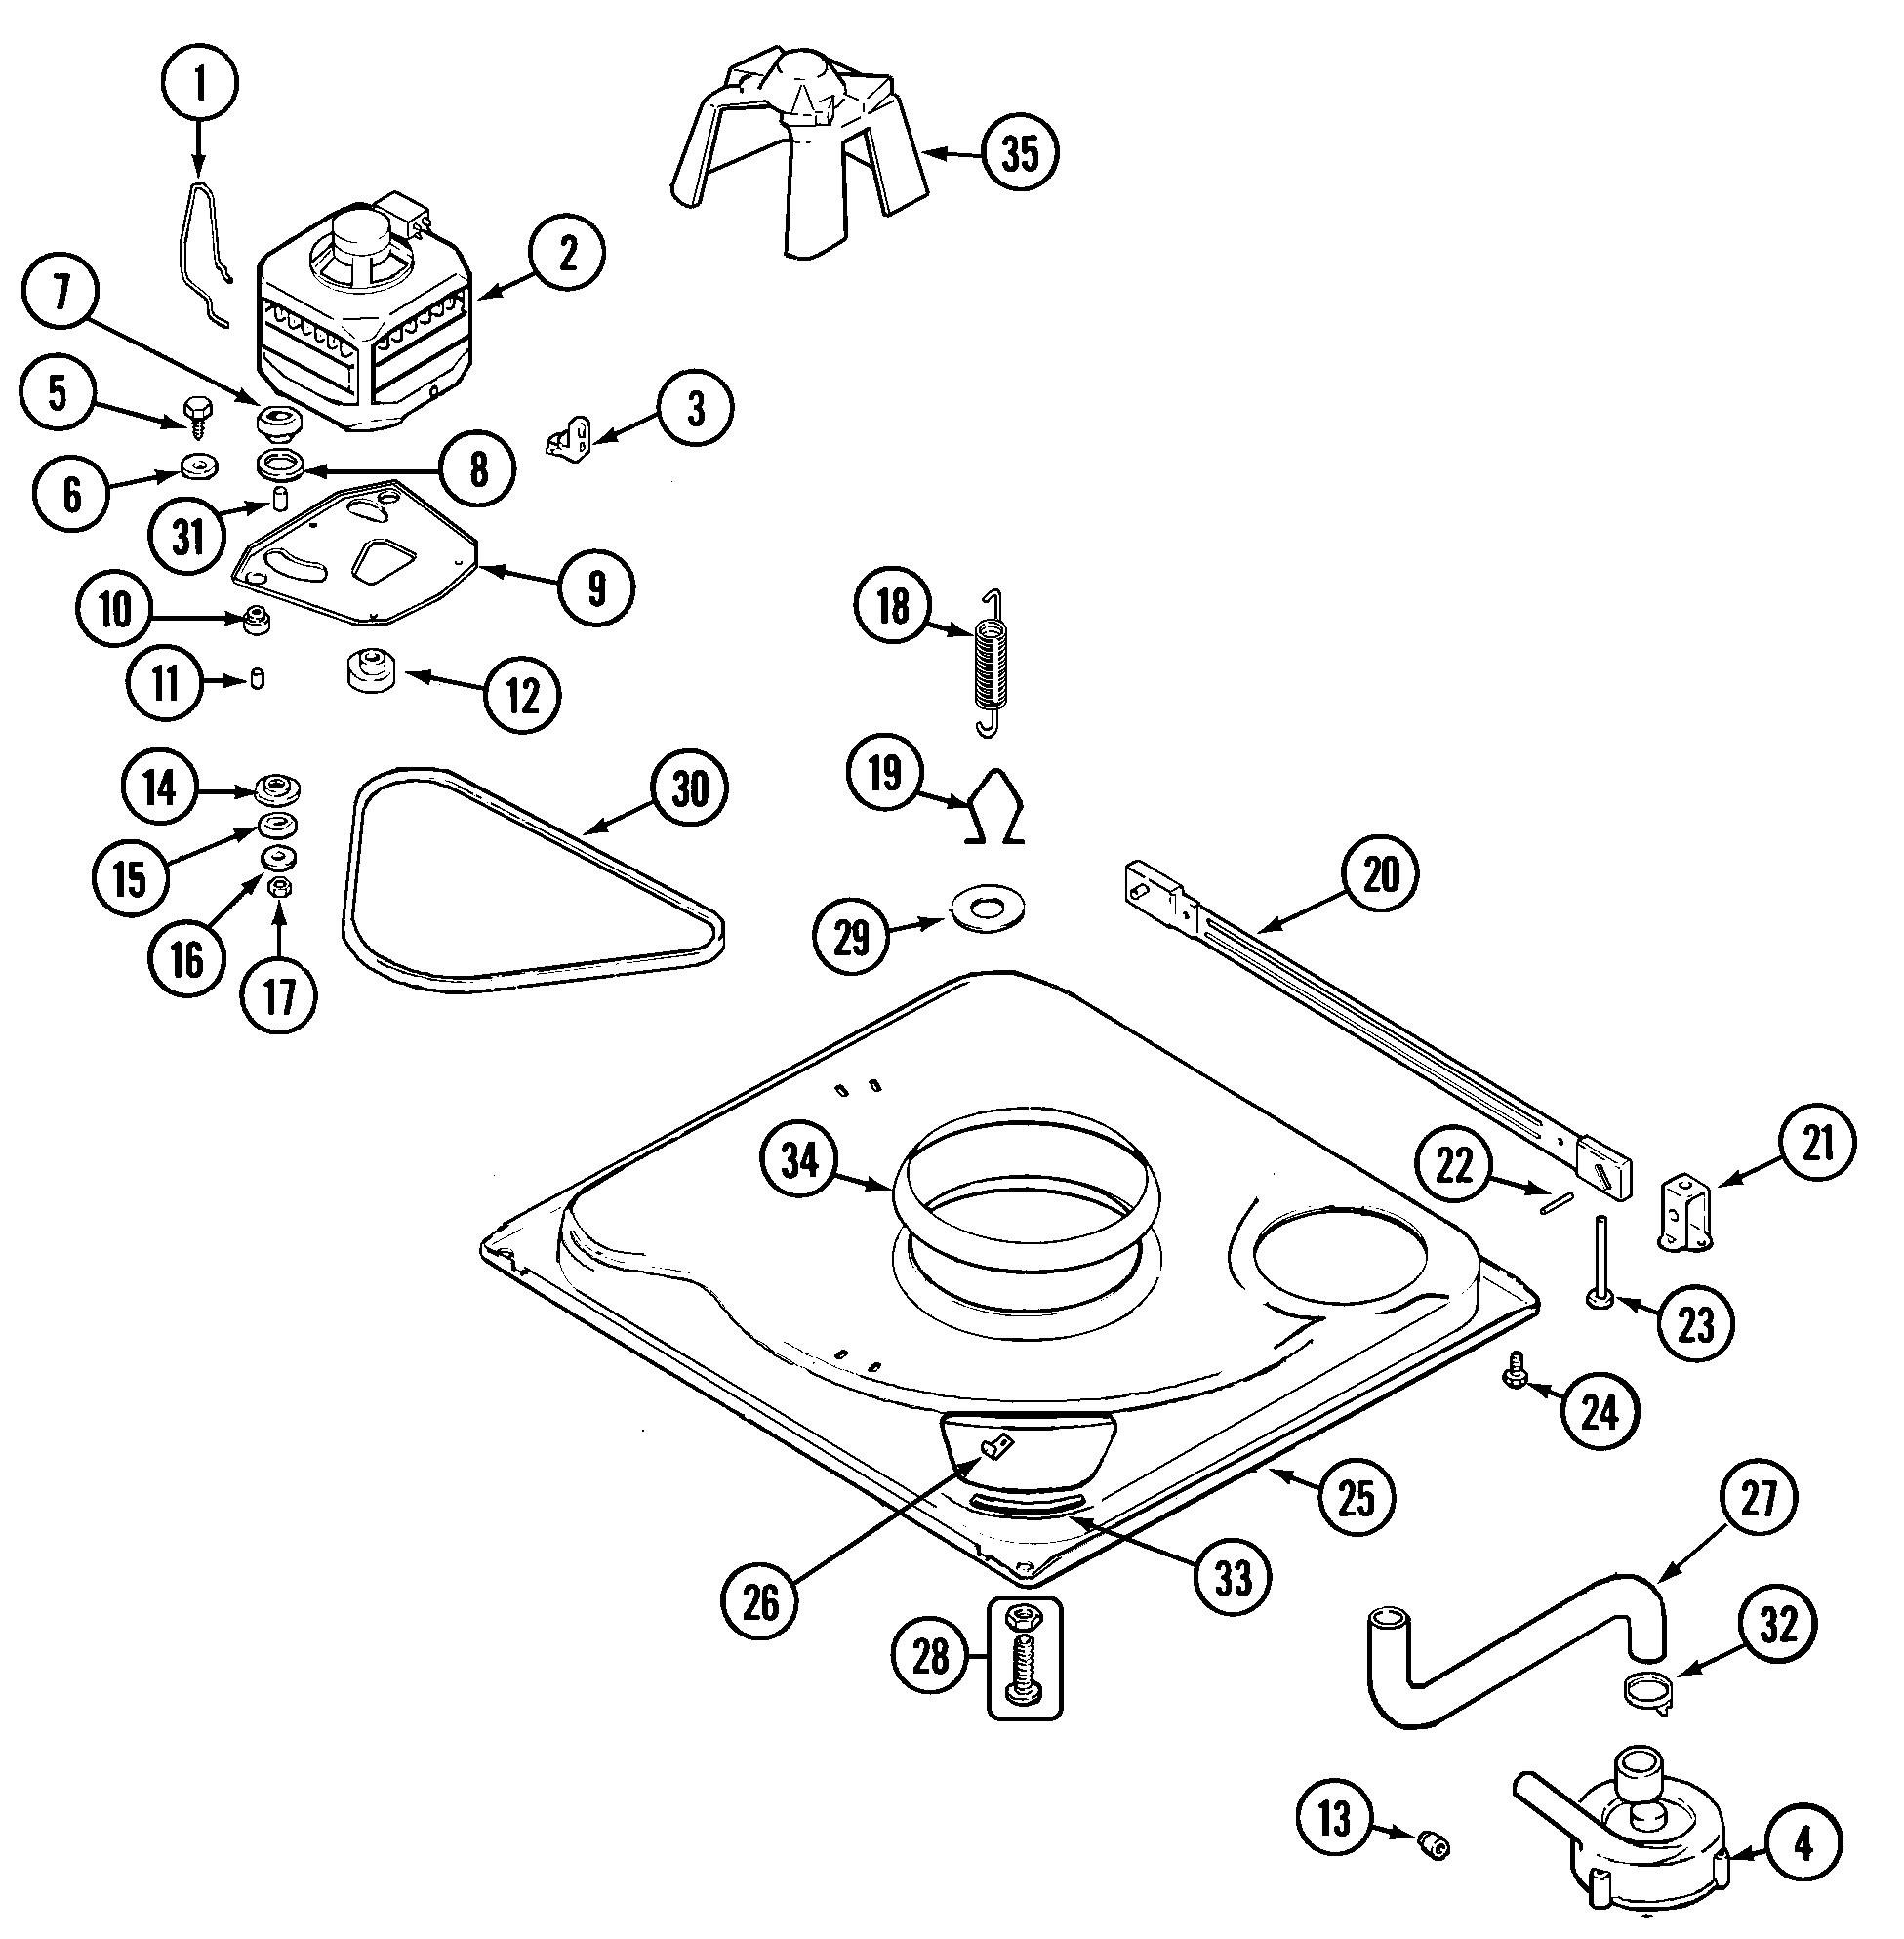 Admiral Lnc A71 Drive Motor